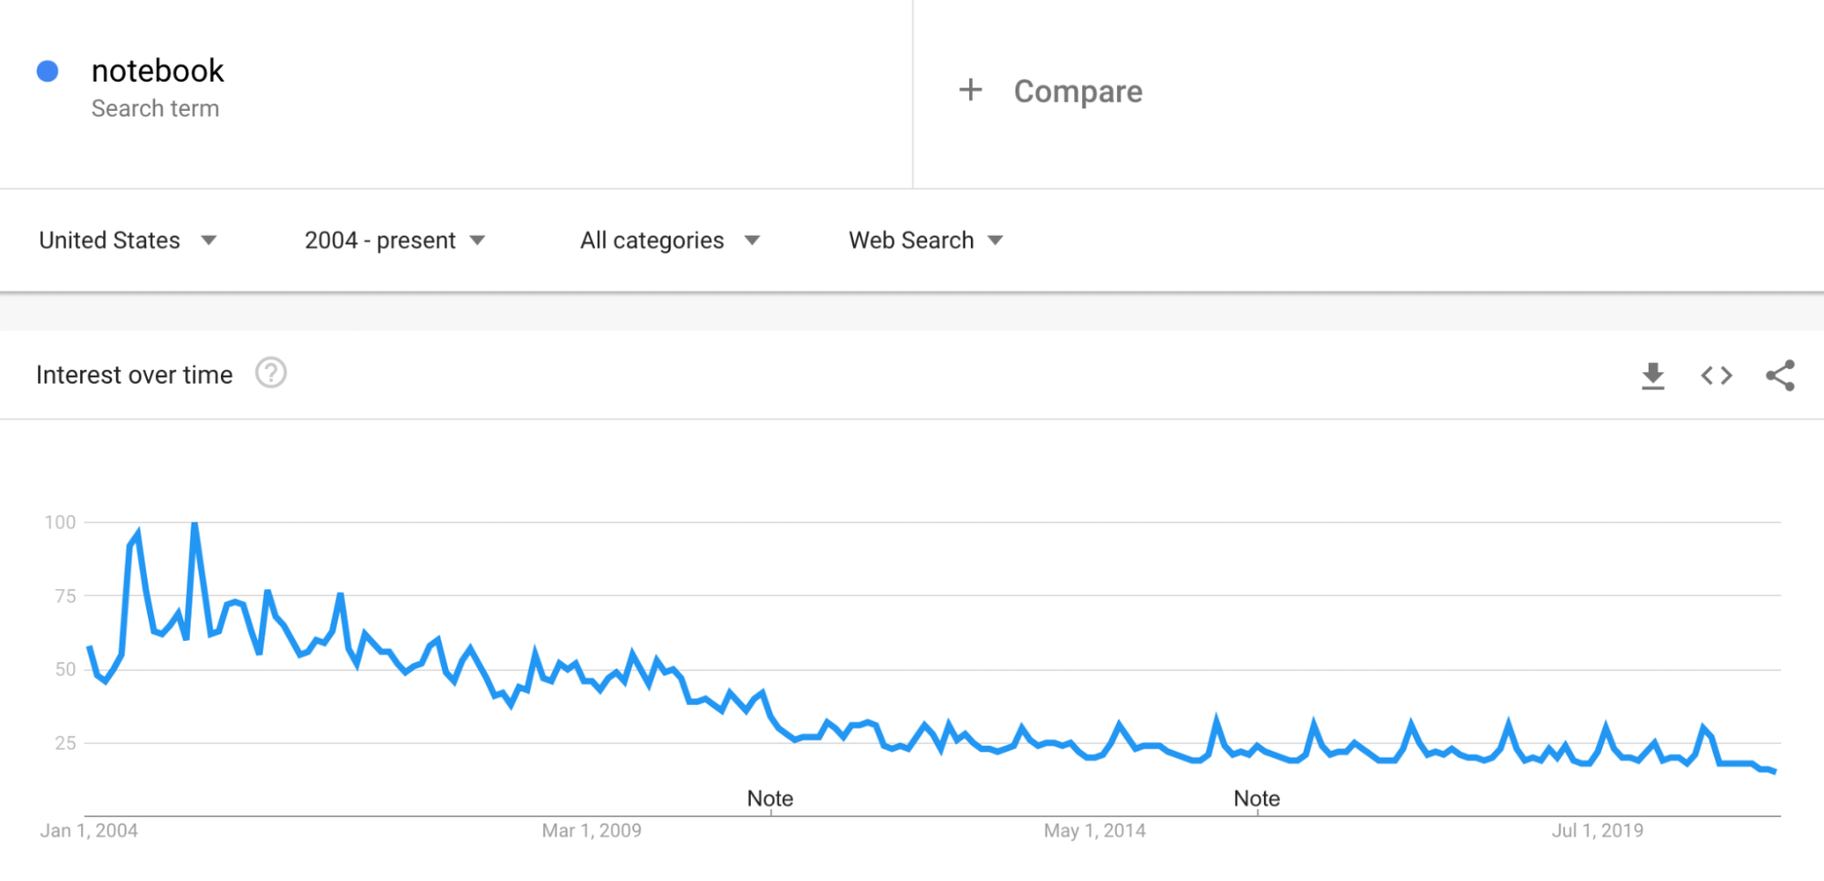 Google Trends: Notebooks